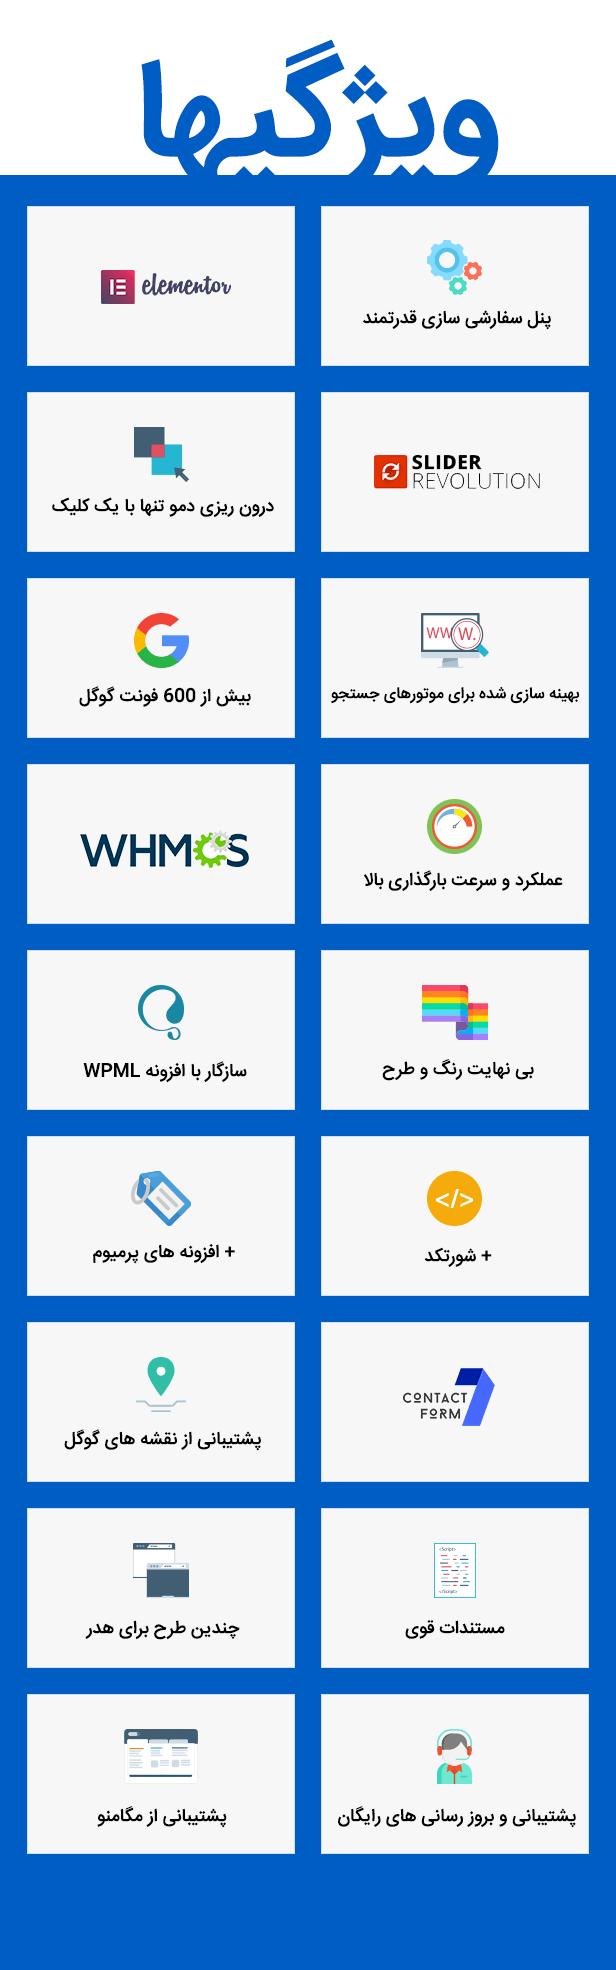 Hostinza | قالب هاستینزا | قالب فروش هاست و دامنه | اسکریپت WHMCS | قالب WHMCS